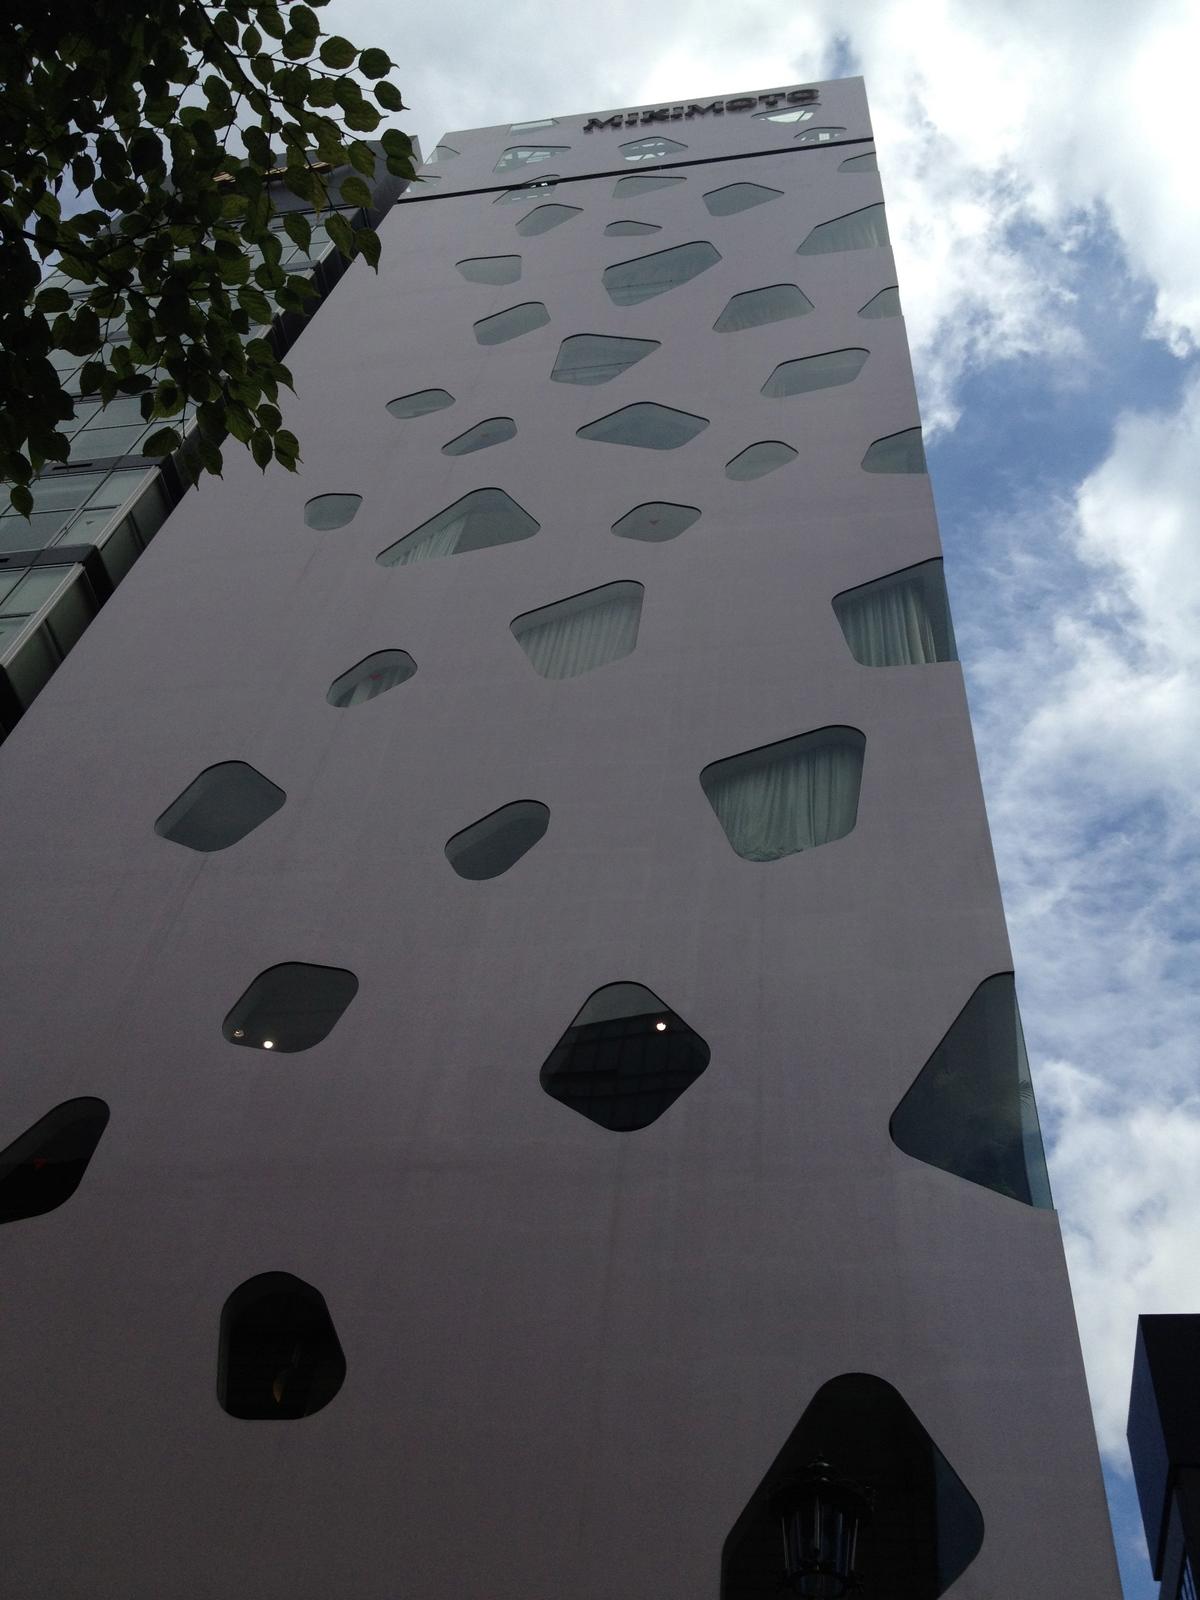 Mikimoto Tower - Toyo Ito